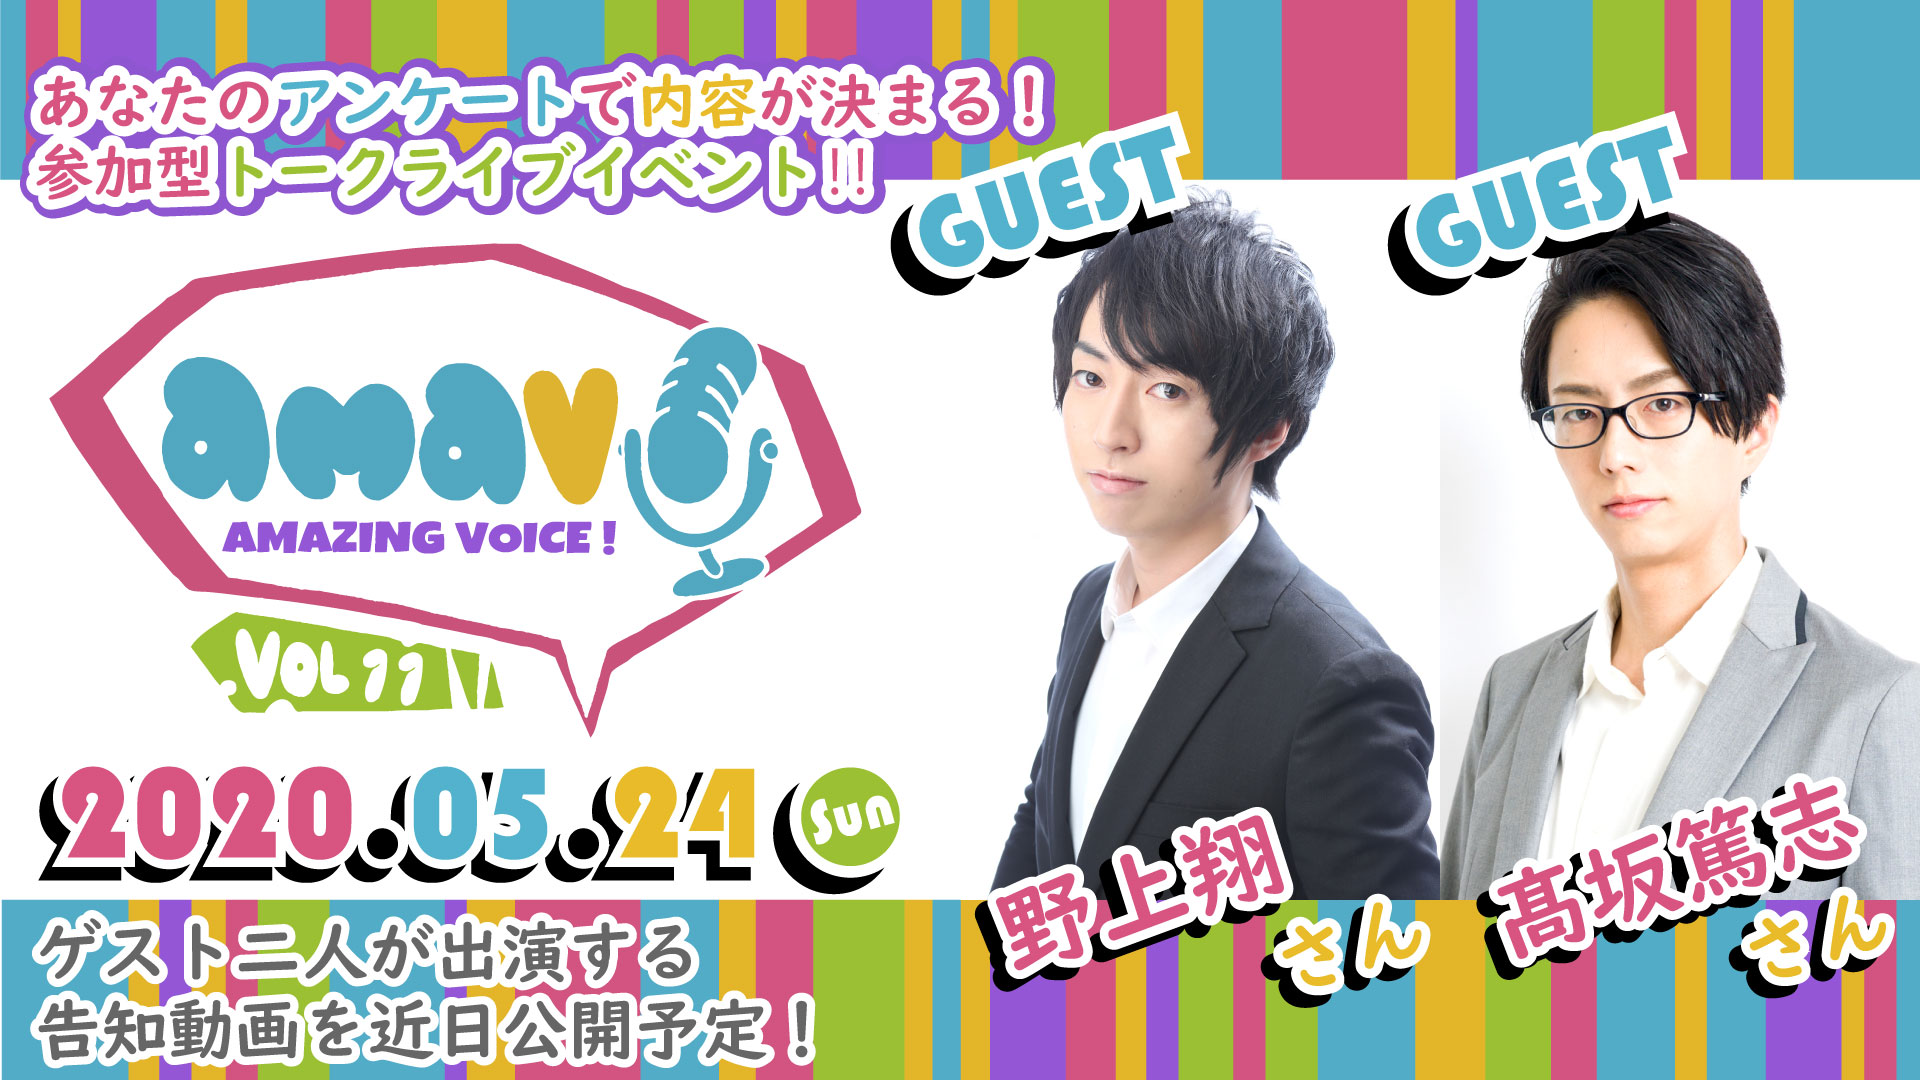 amavo vol.11 【Guest:野上翔さん 髙坂篤志さん】